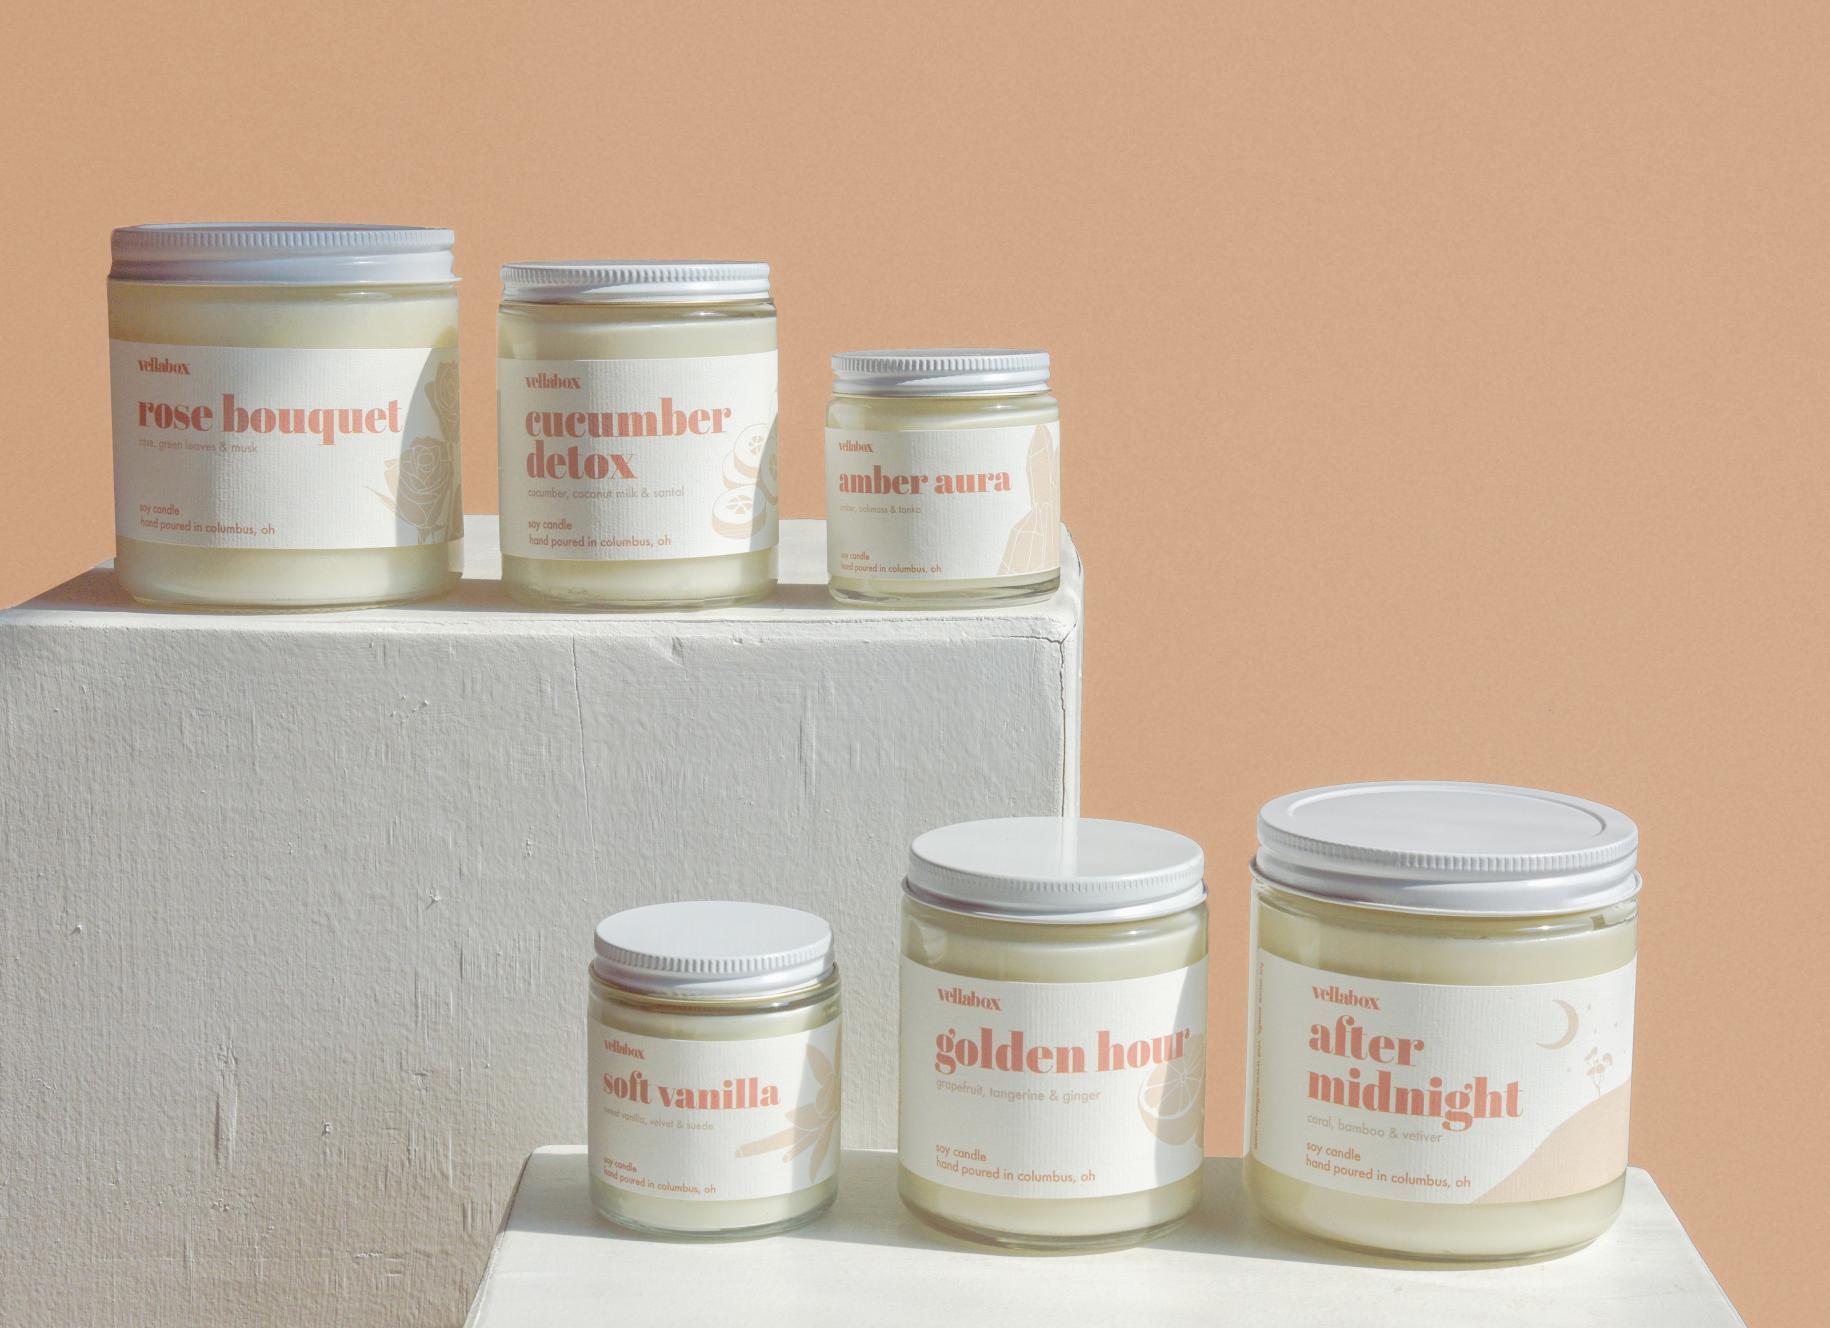 6 scents make the Vellabox signature collection